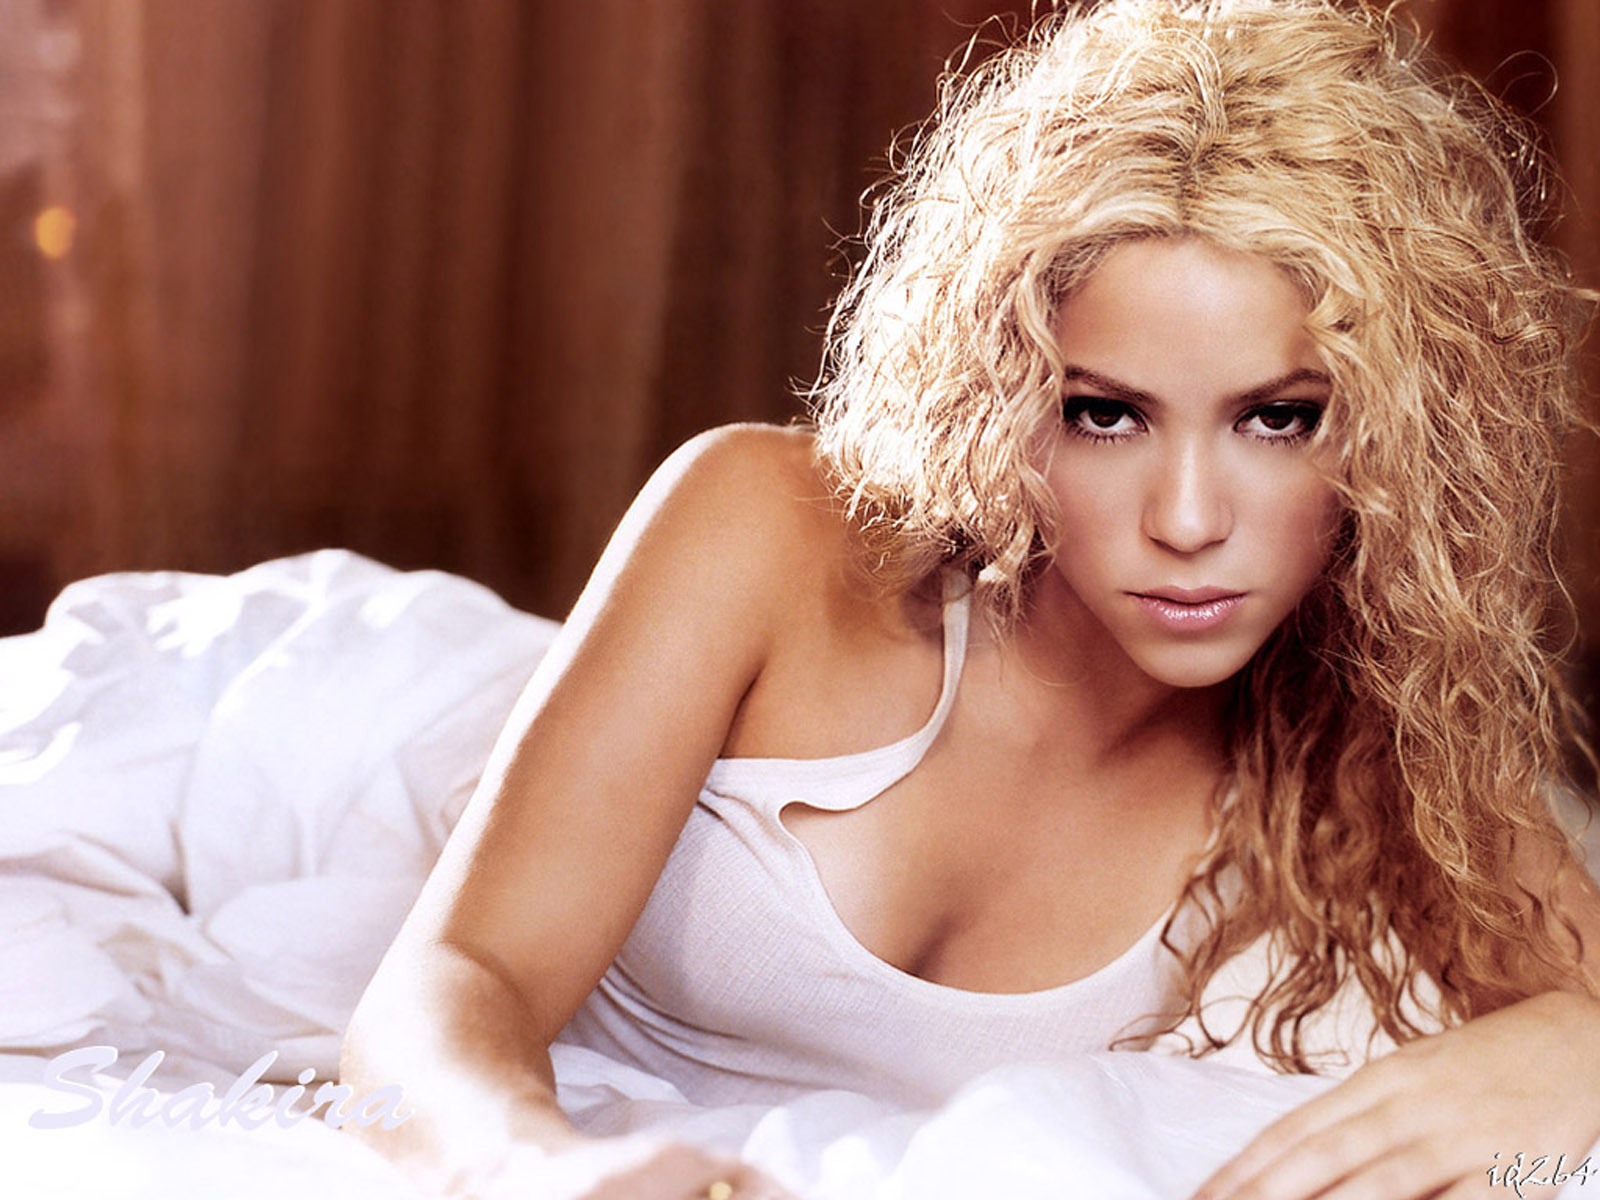 http://3.bp.blogspot.com/-UqEuctWwppM/TzIR7qwVirI/AAAAAAAAE4g/rNLjaN2MViA/s1600/Shakira+wallpaper+(21).jpg